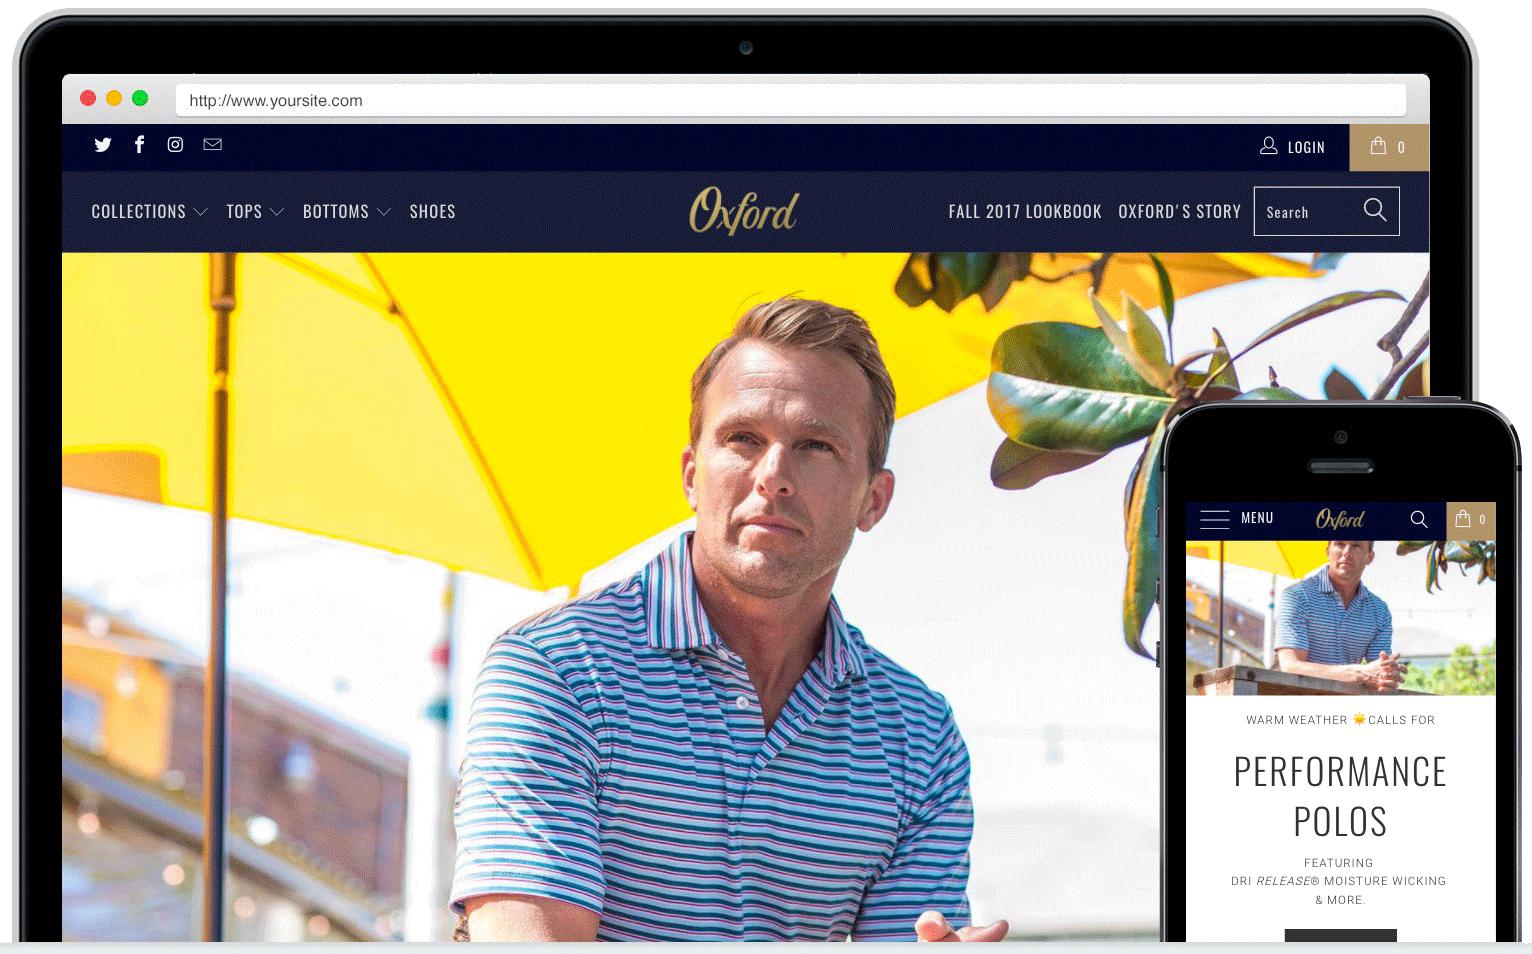 Full Service Digital Media Agency. - Brand Identity Design | Logo Design | Rebranding |Photography & Video | Graphic Design | Business Marketing Strategy |Social Media Planning |Digital Marketing | & Consulting